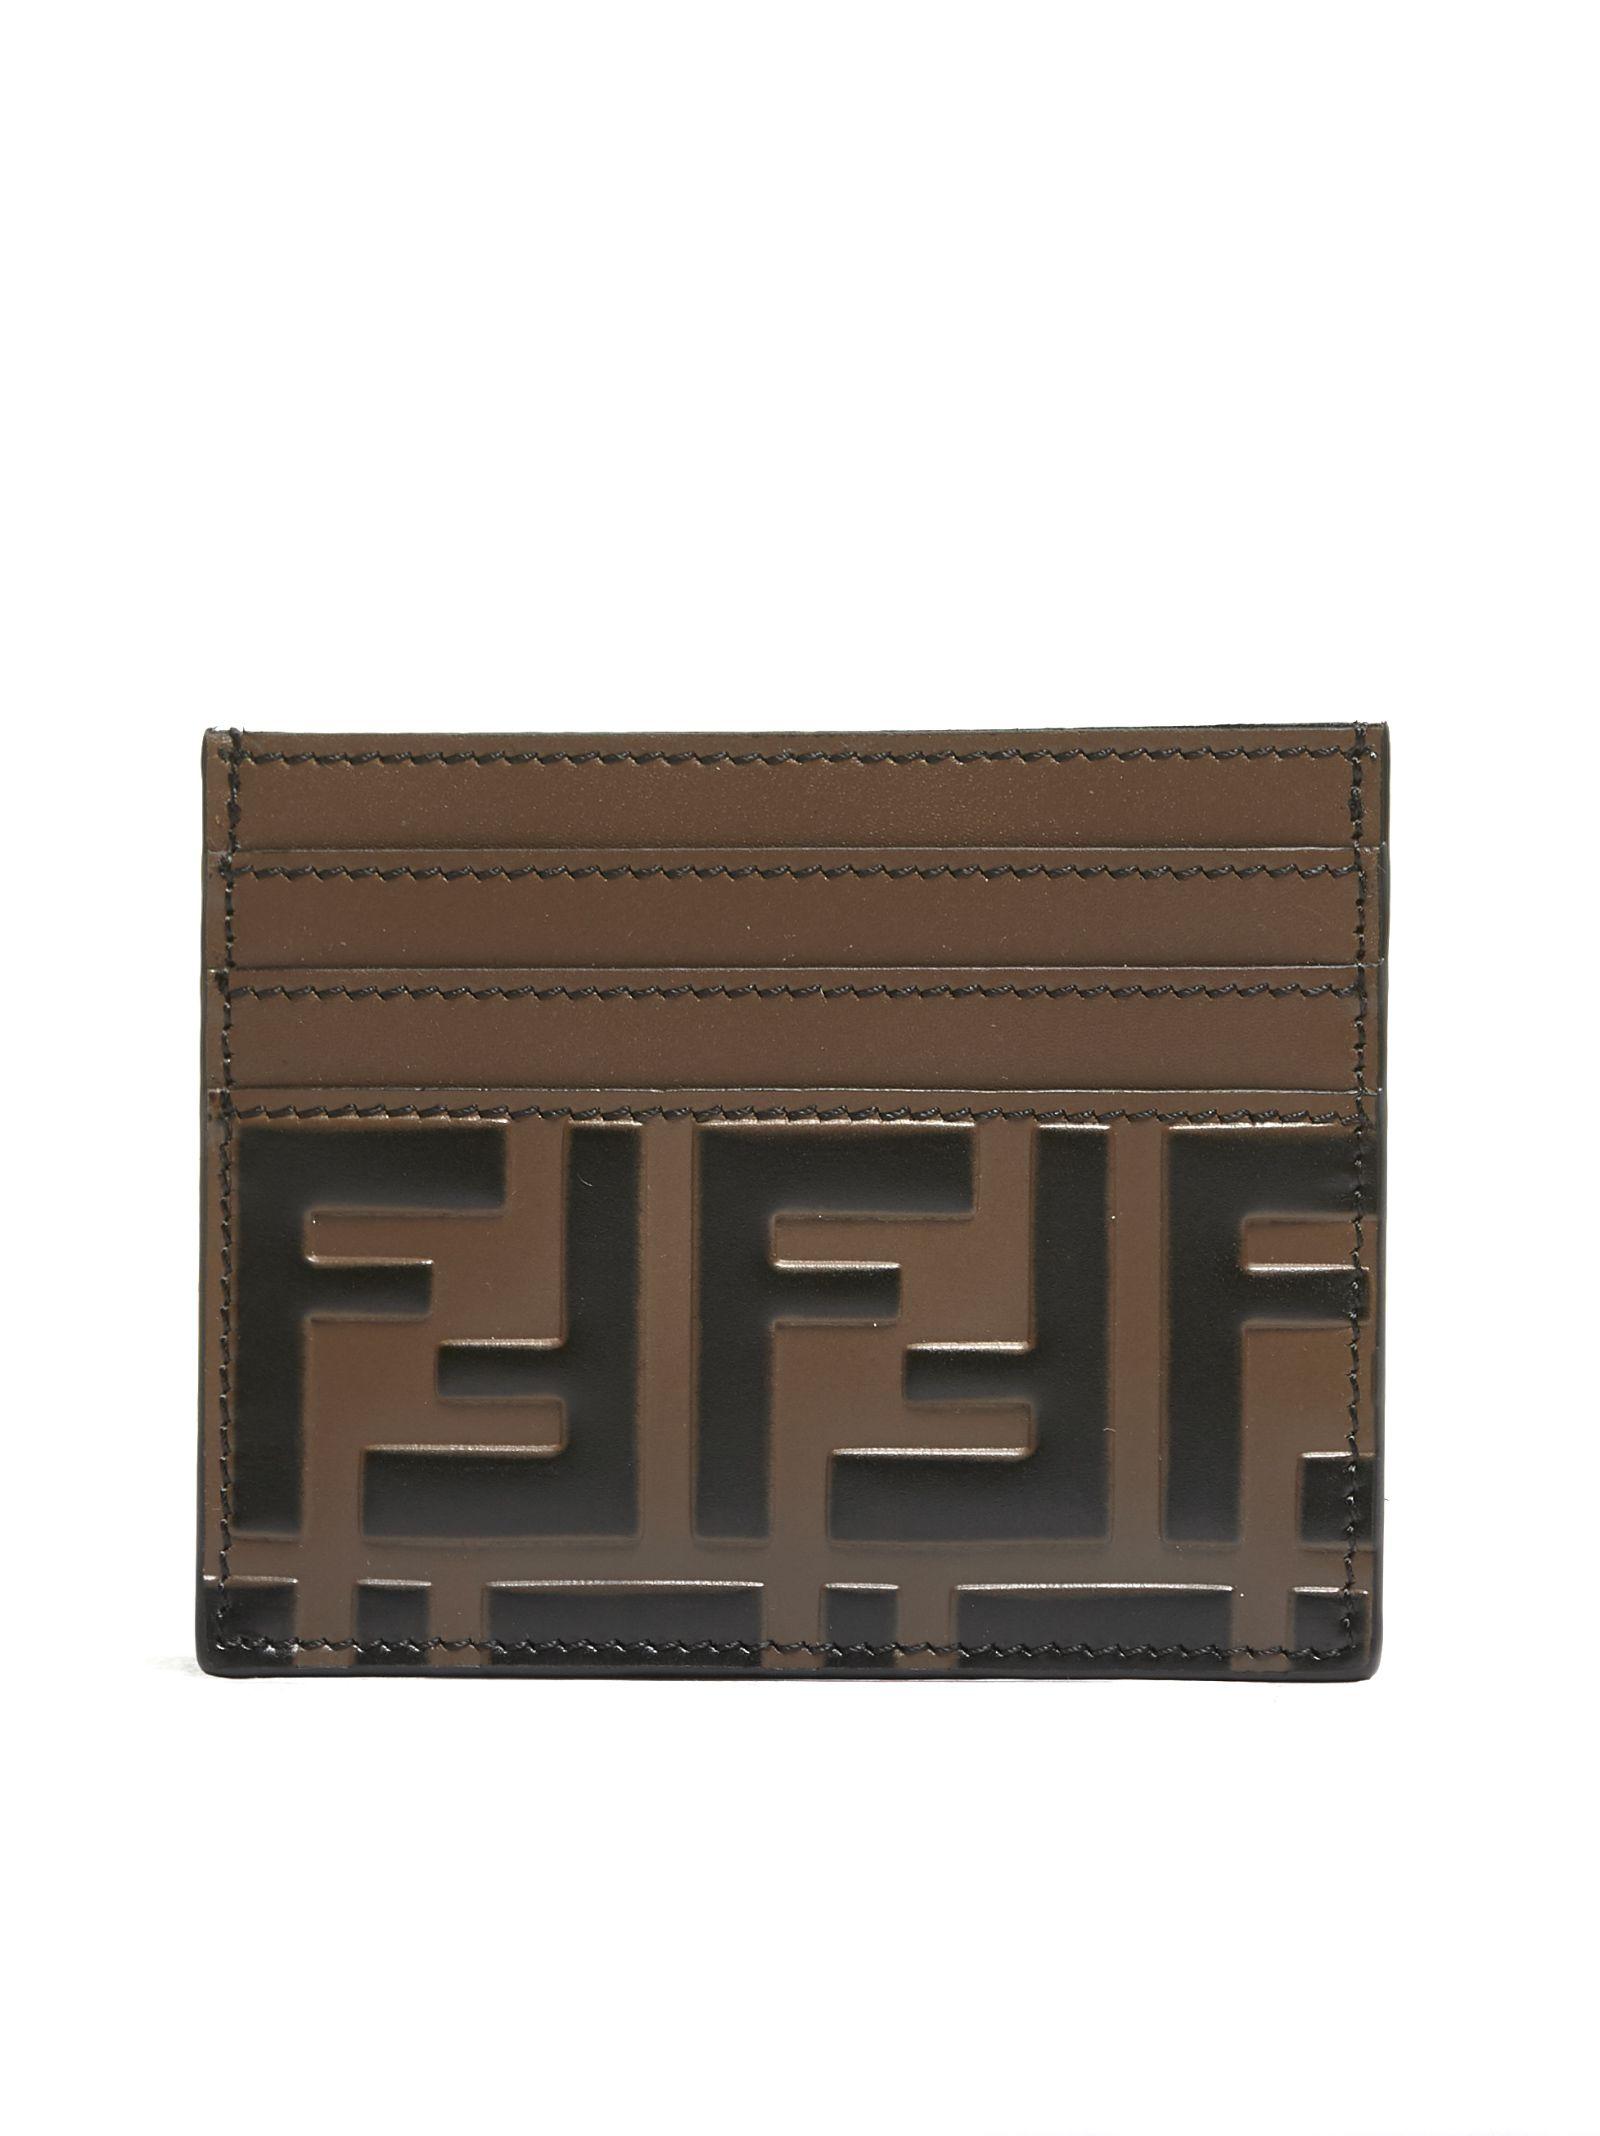 Fendi Embossed Leather Card Holder